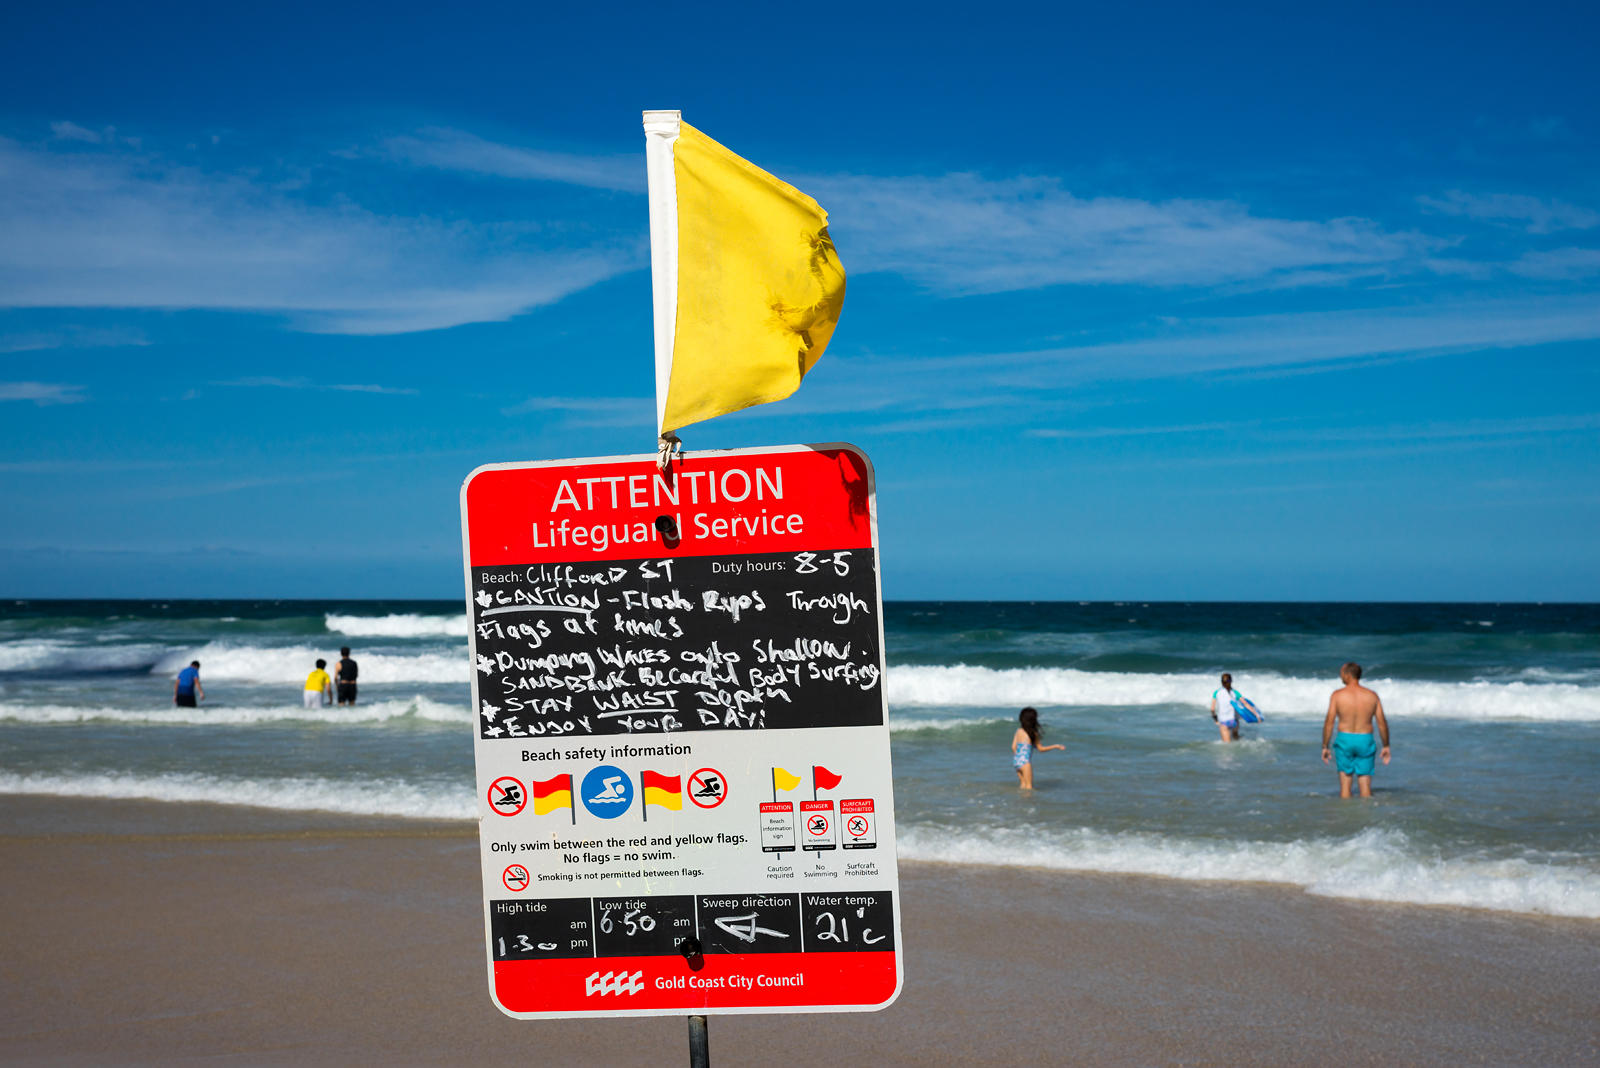 Life guard notice at Surfers paradise, Gold Coast.